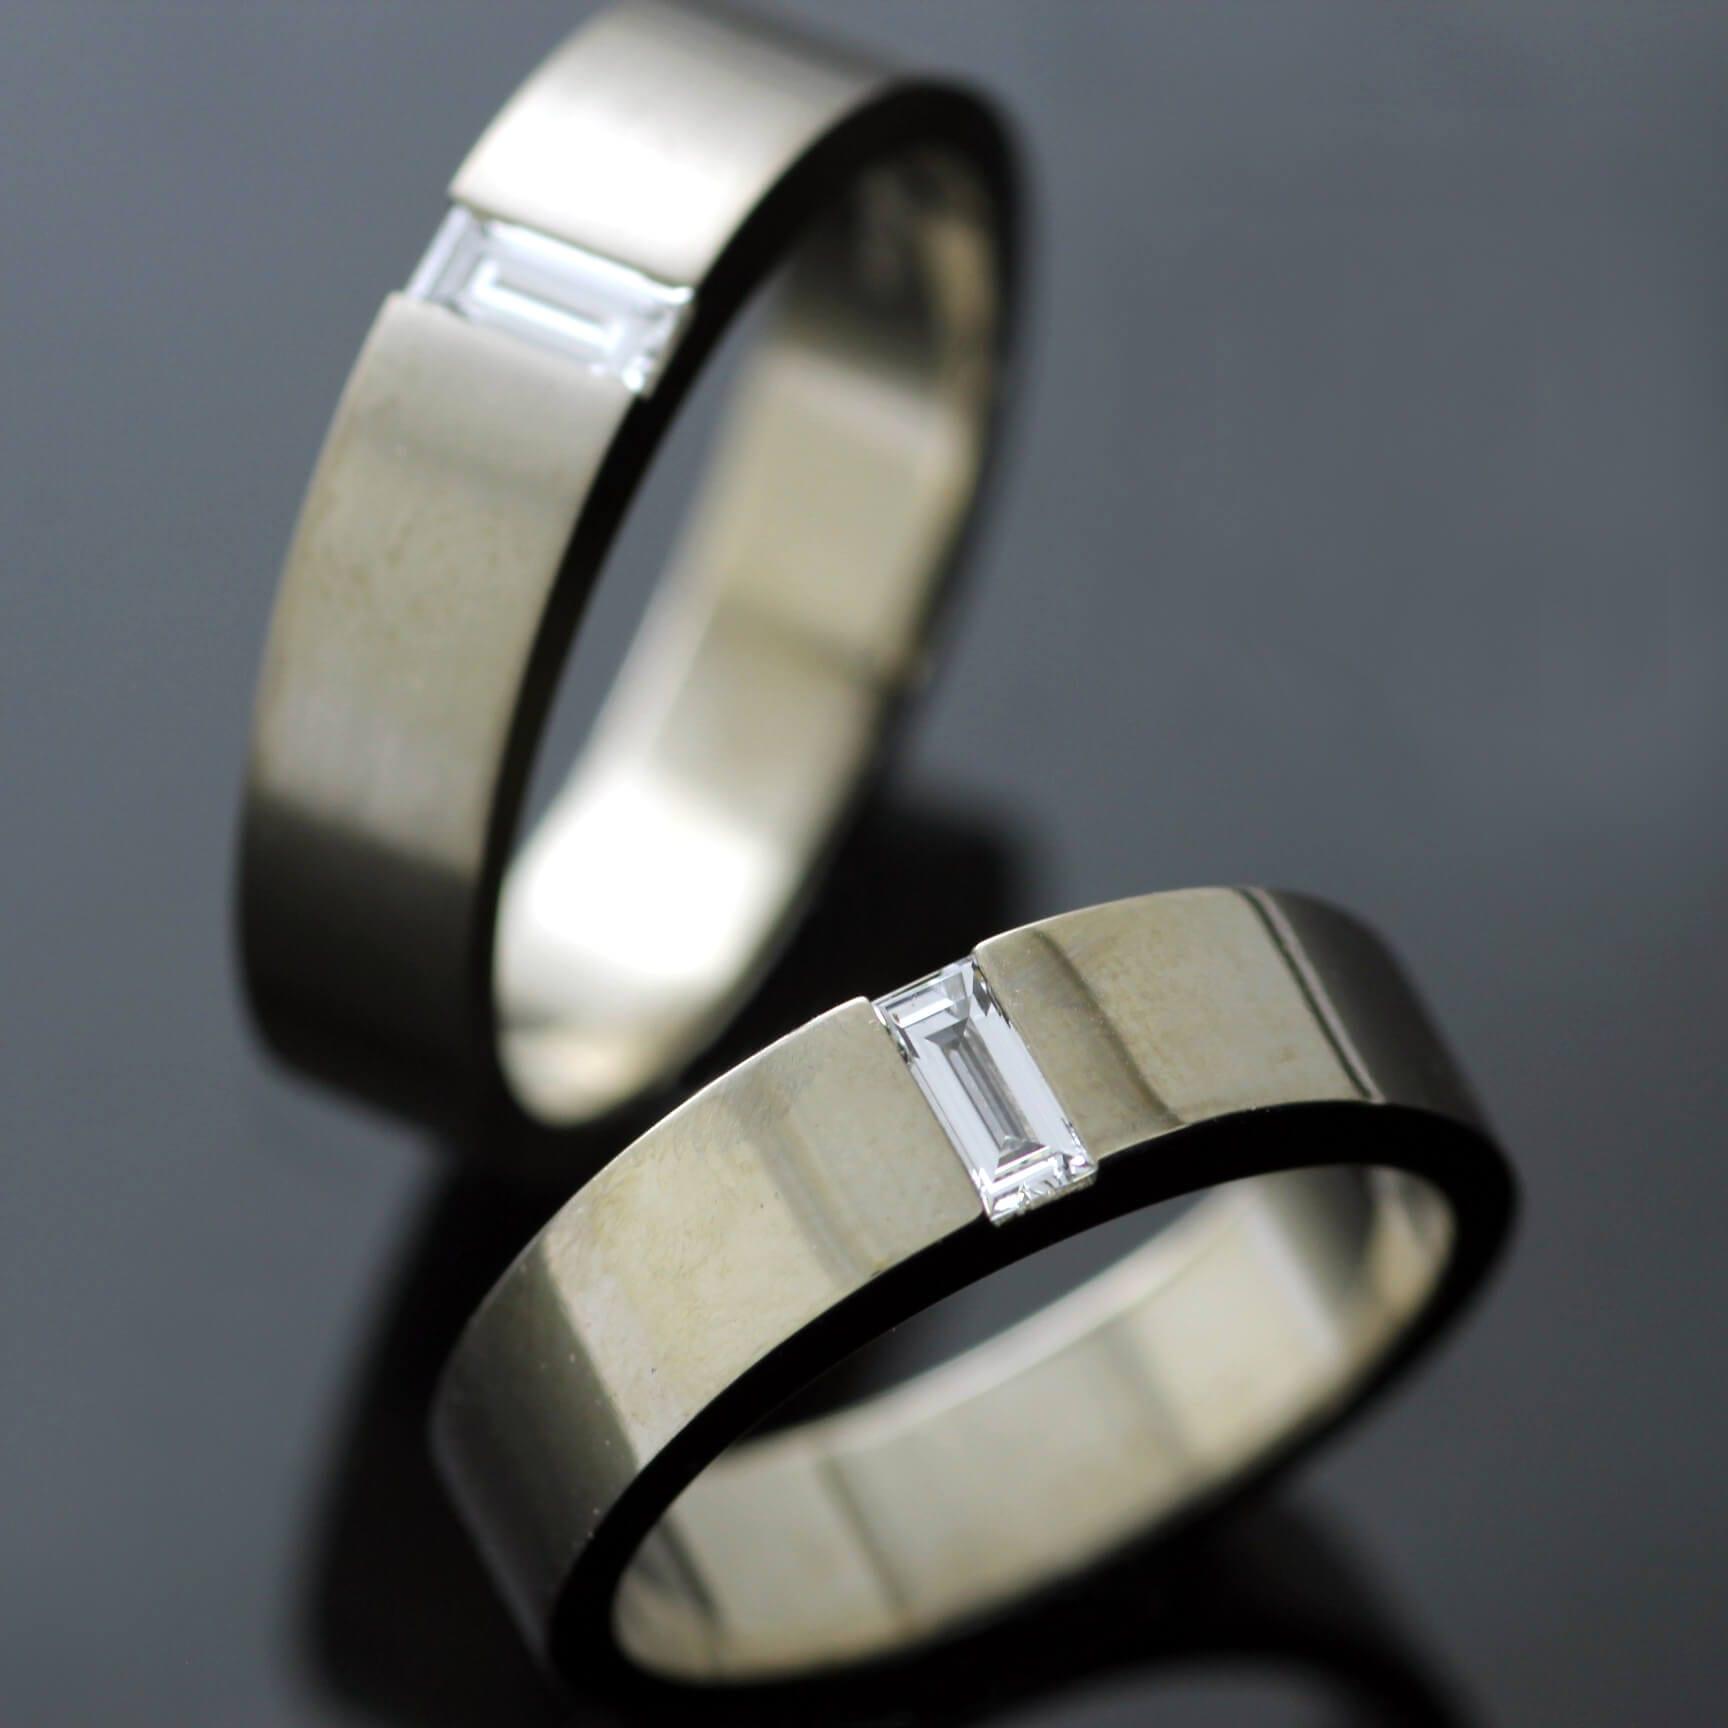 Handmade unique matching wedding bands with set Diamond gemstones